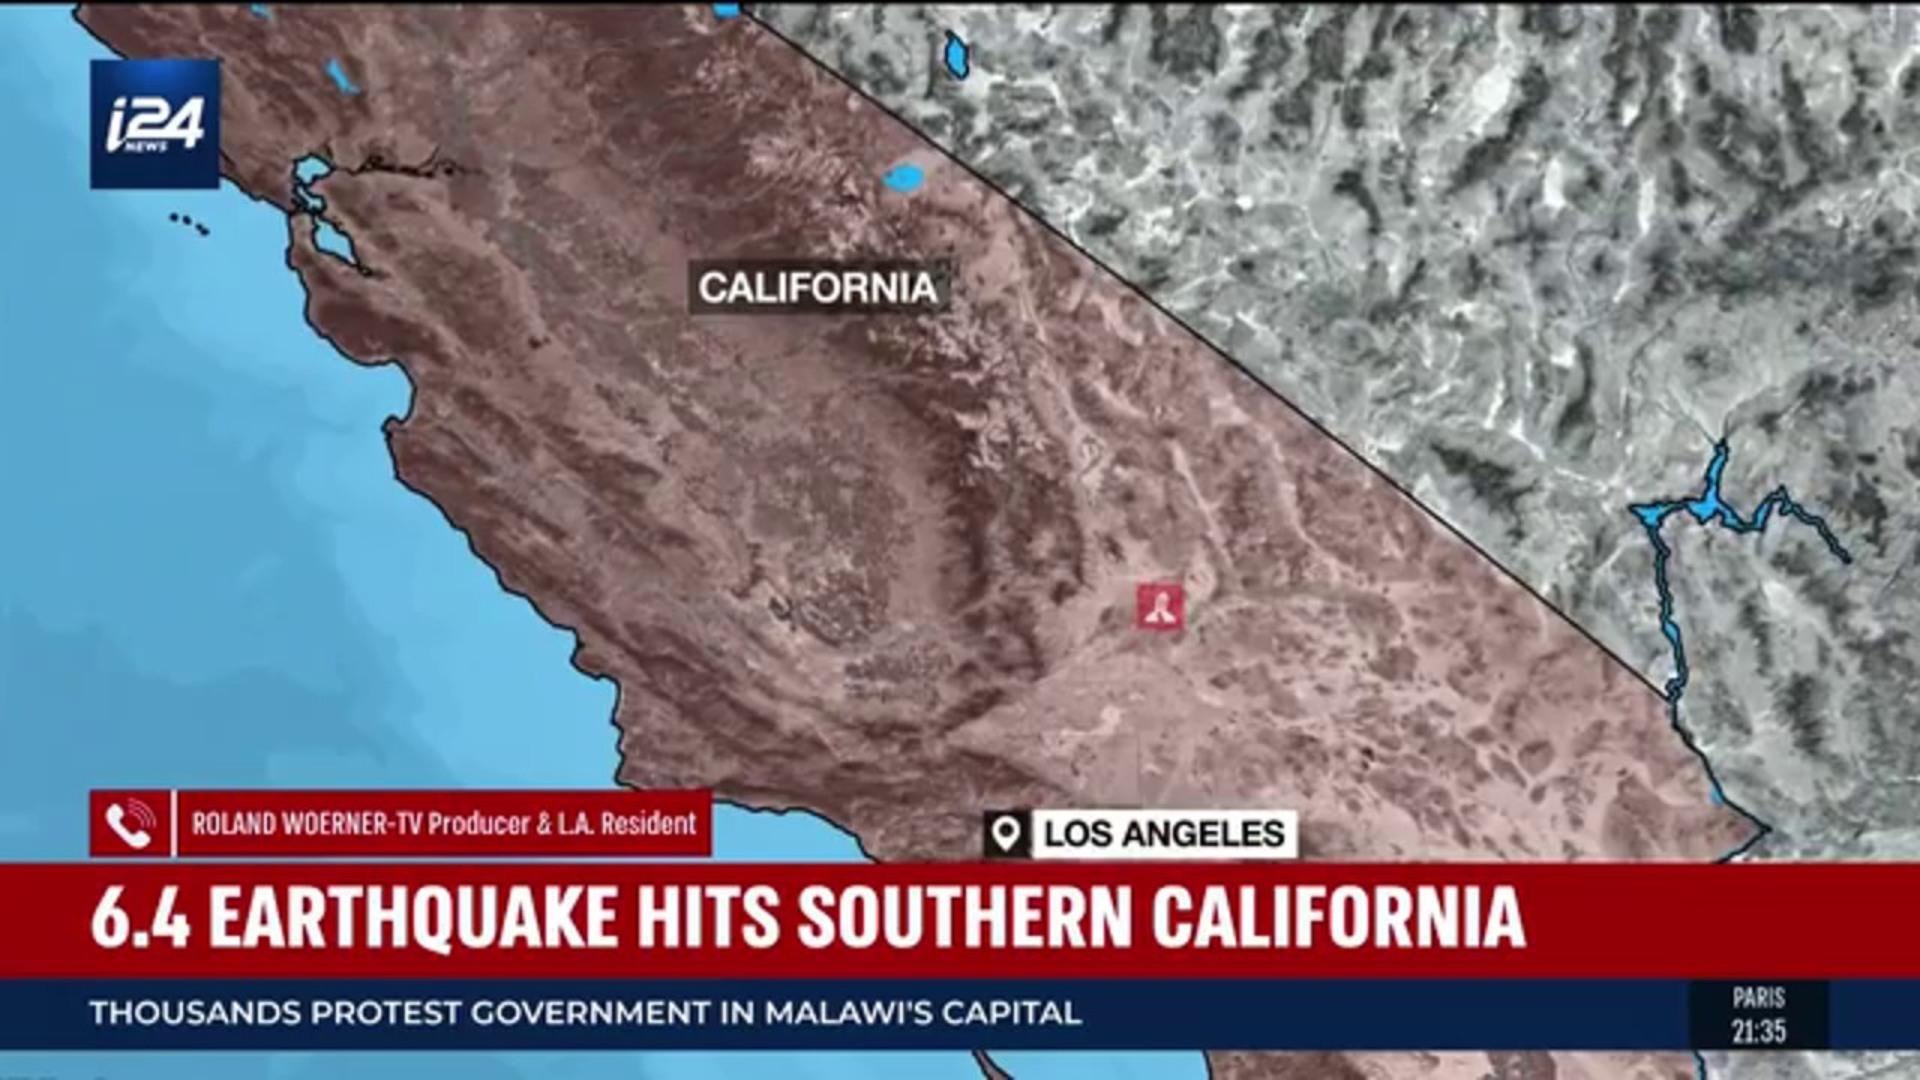 BREAKING NEWS | 6 4 earthquake hits Southern California